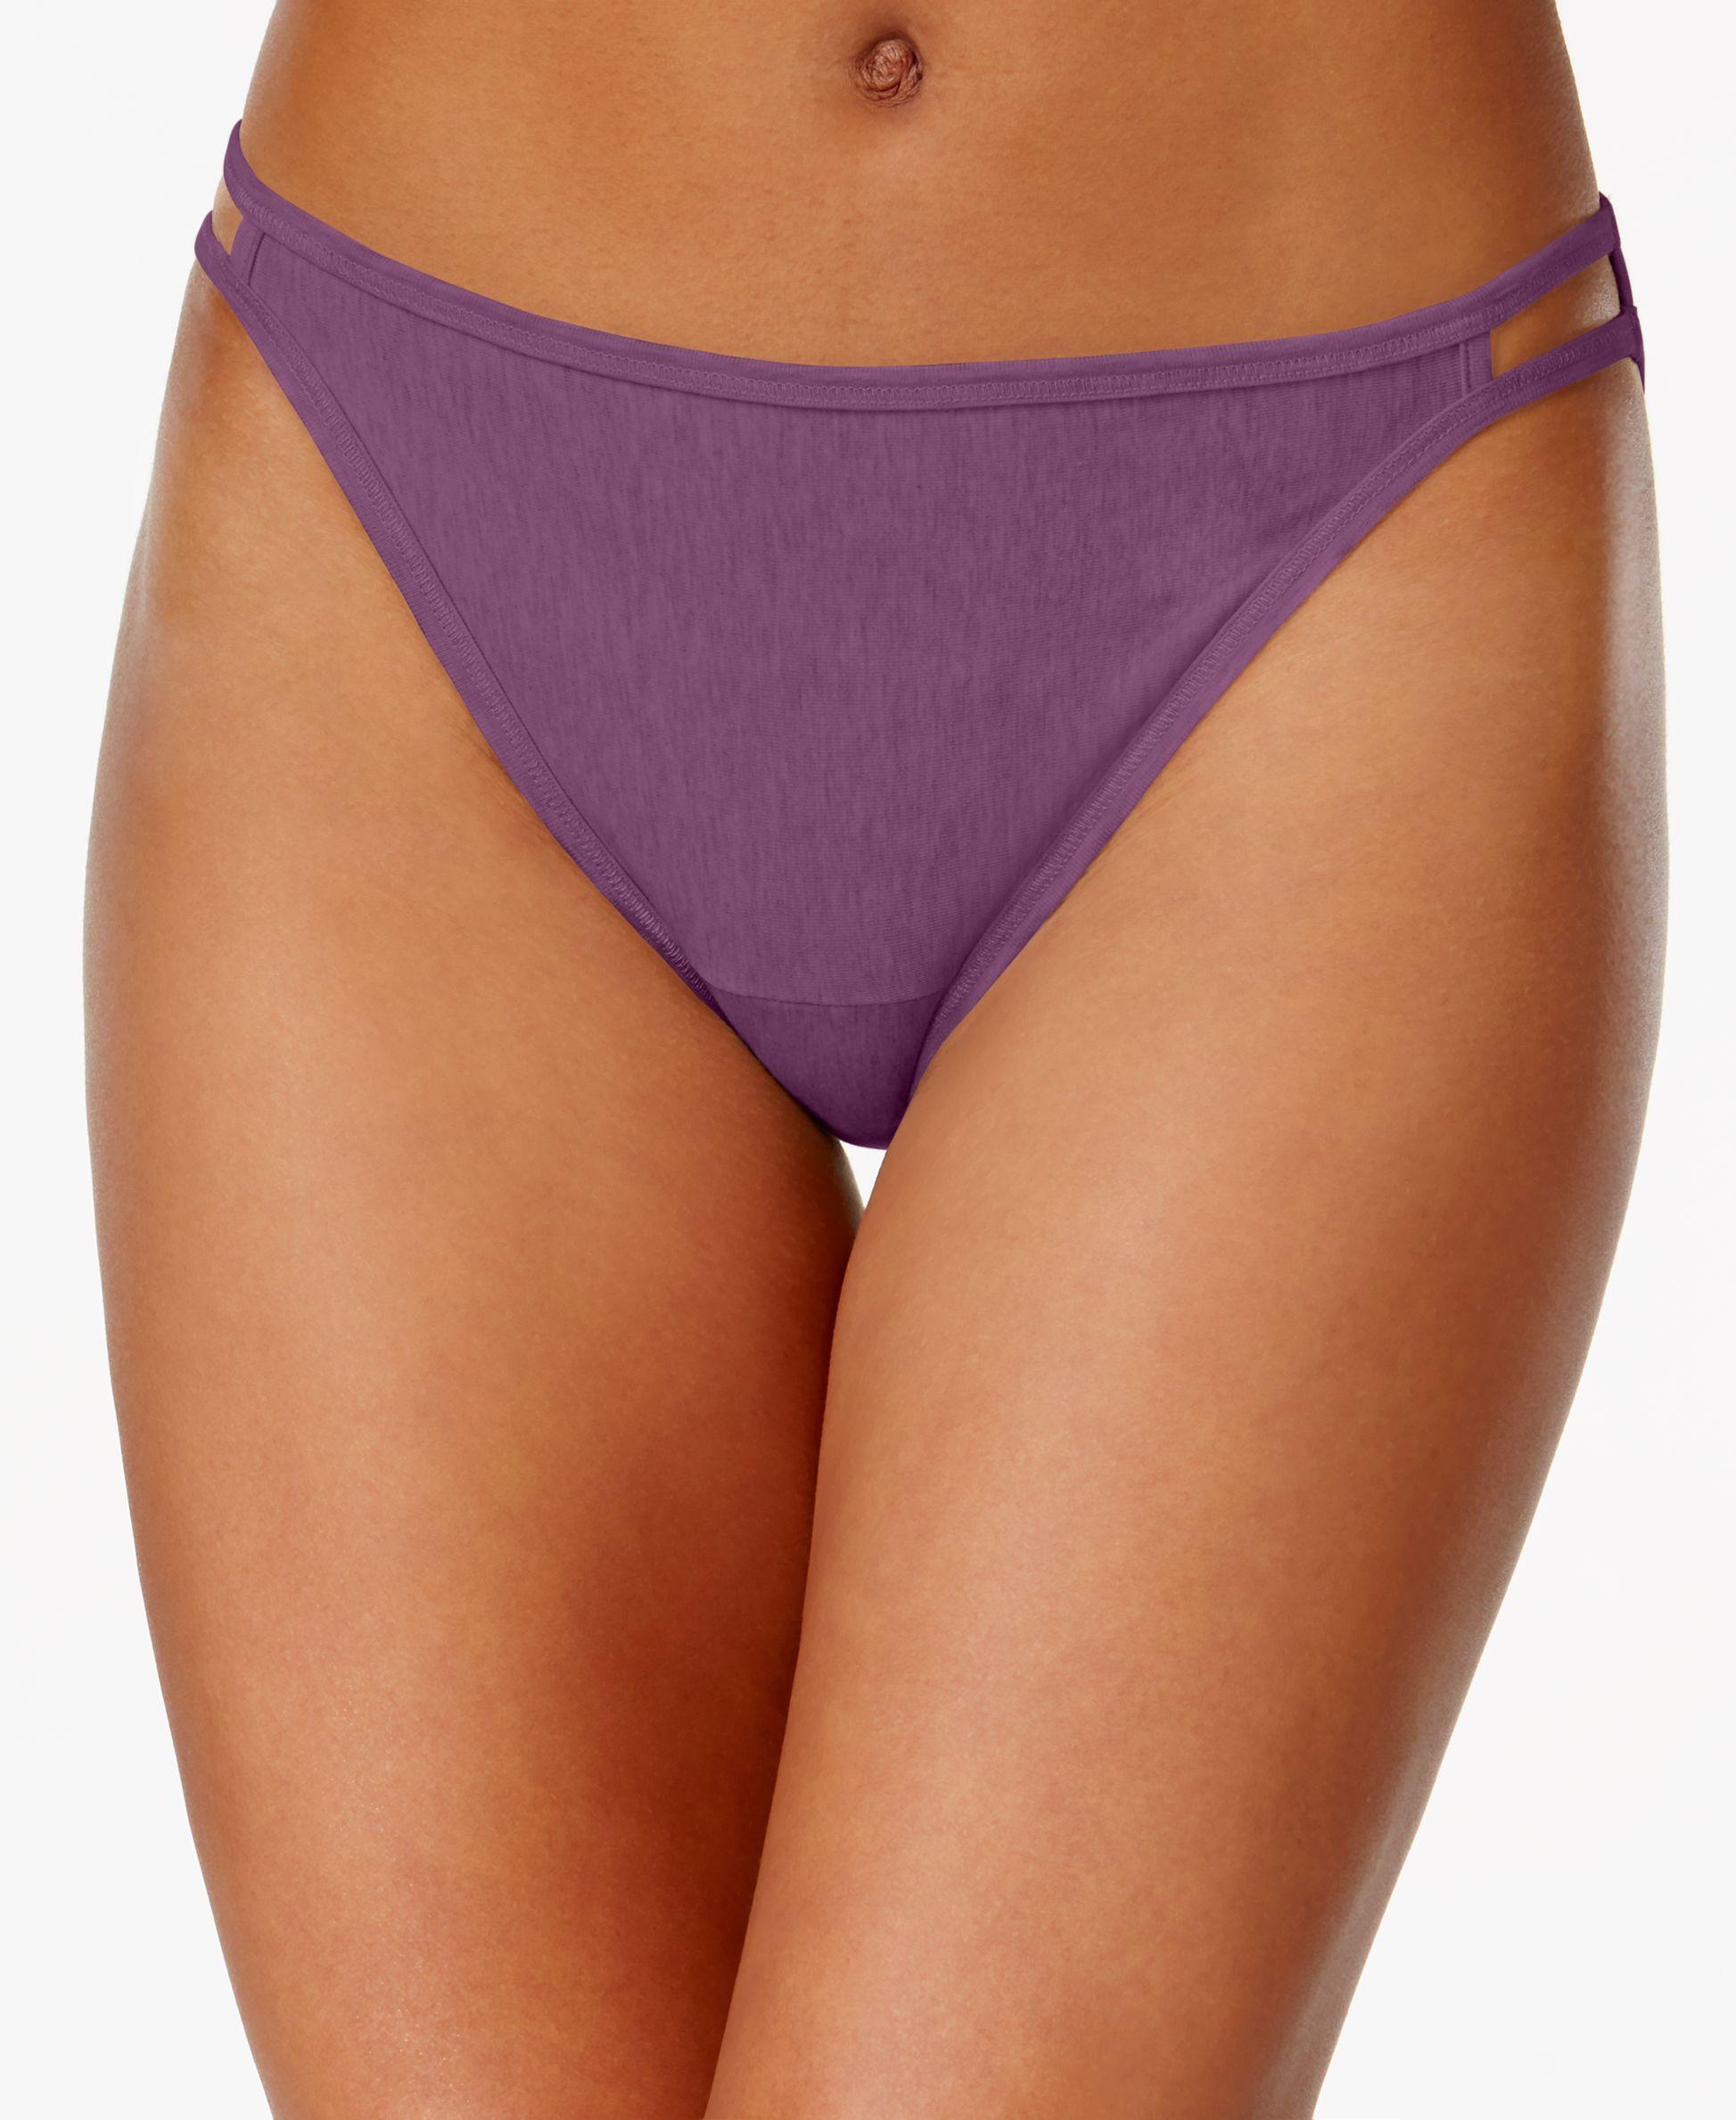 4cc9bde2e68cb Vanity Fair Illumination Heathered Cotton Bikini 18315 - Lingerie    Shapewear - Women - Macy s